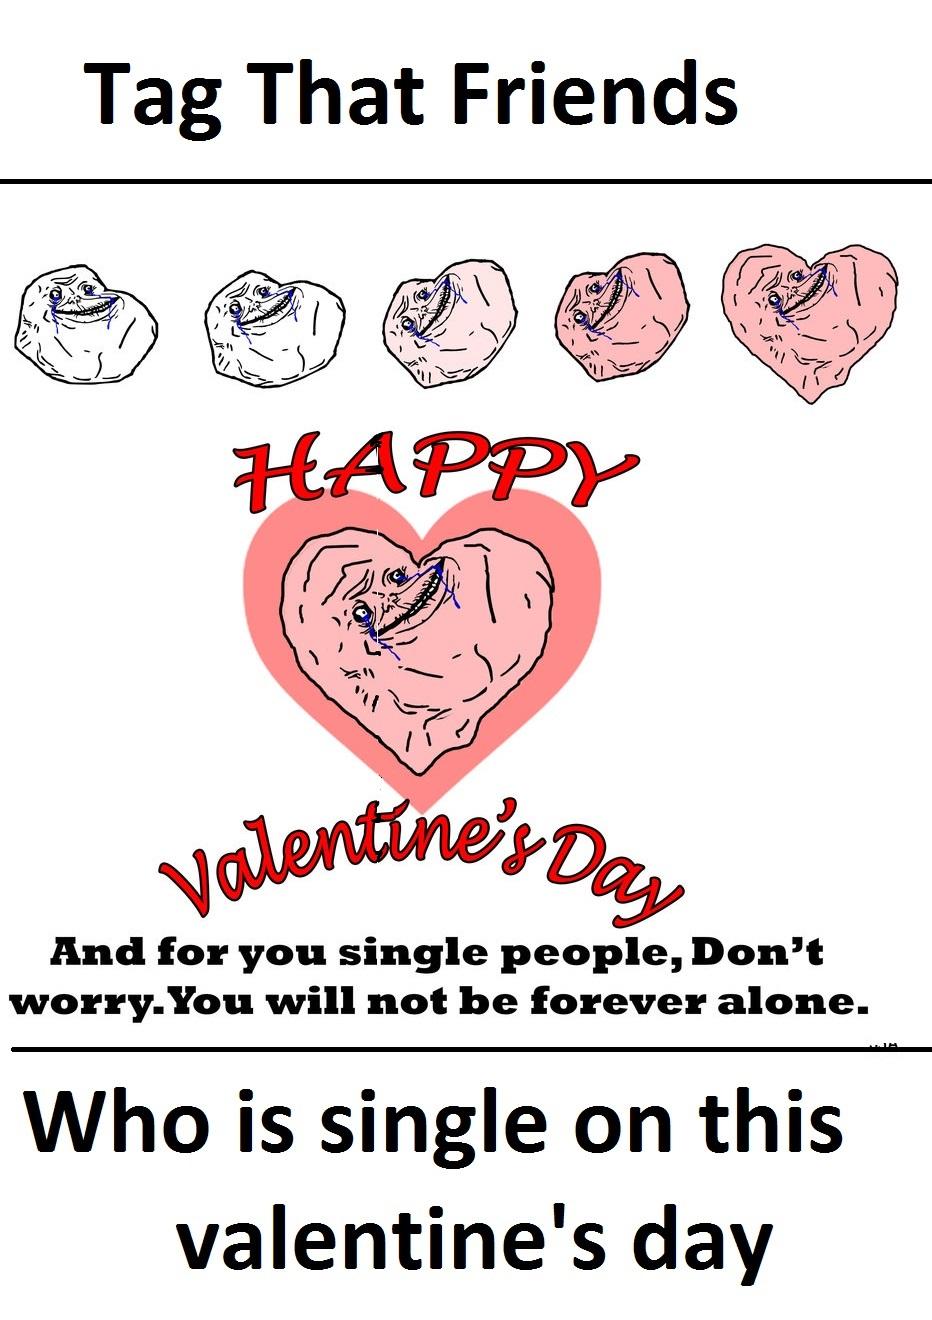 Raunchy Valentine's Day Memes : raunchy, valentine's, memes, Happy, Valentines, Memes, Funny, Valentine, [2021]